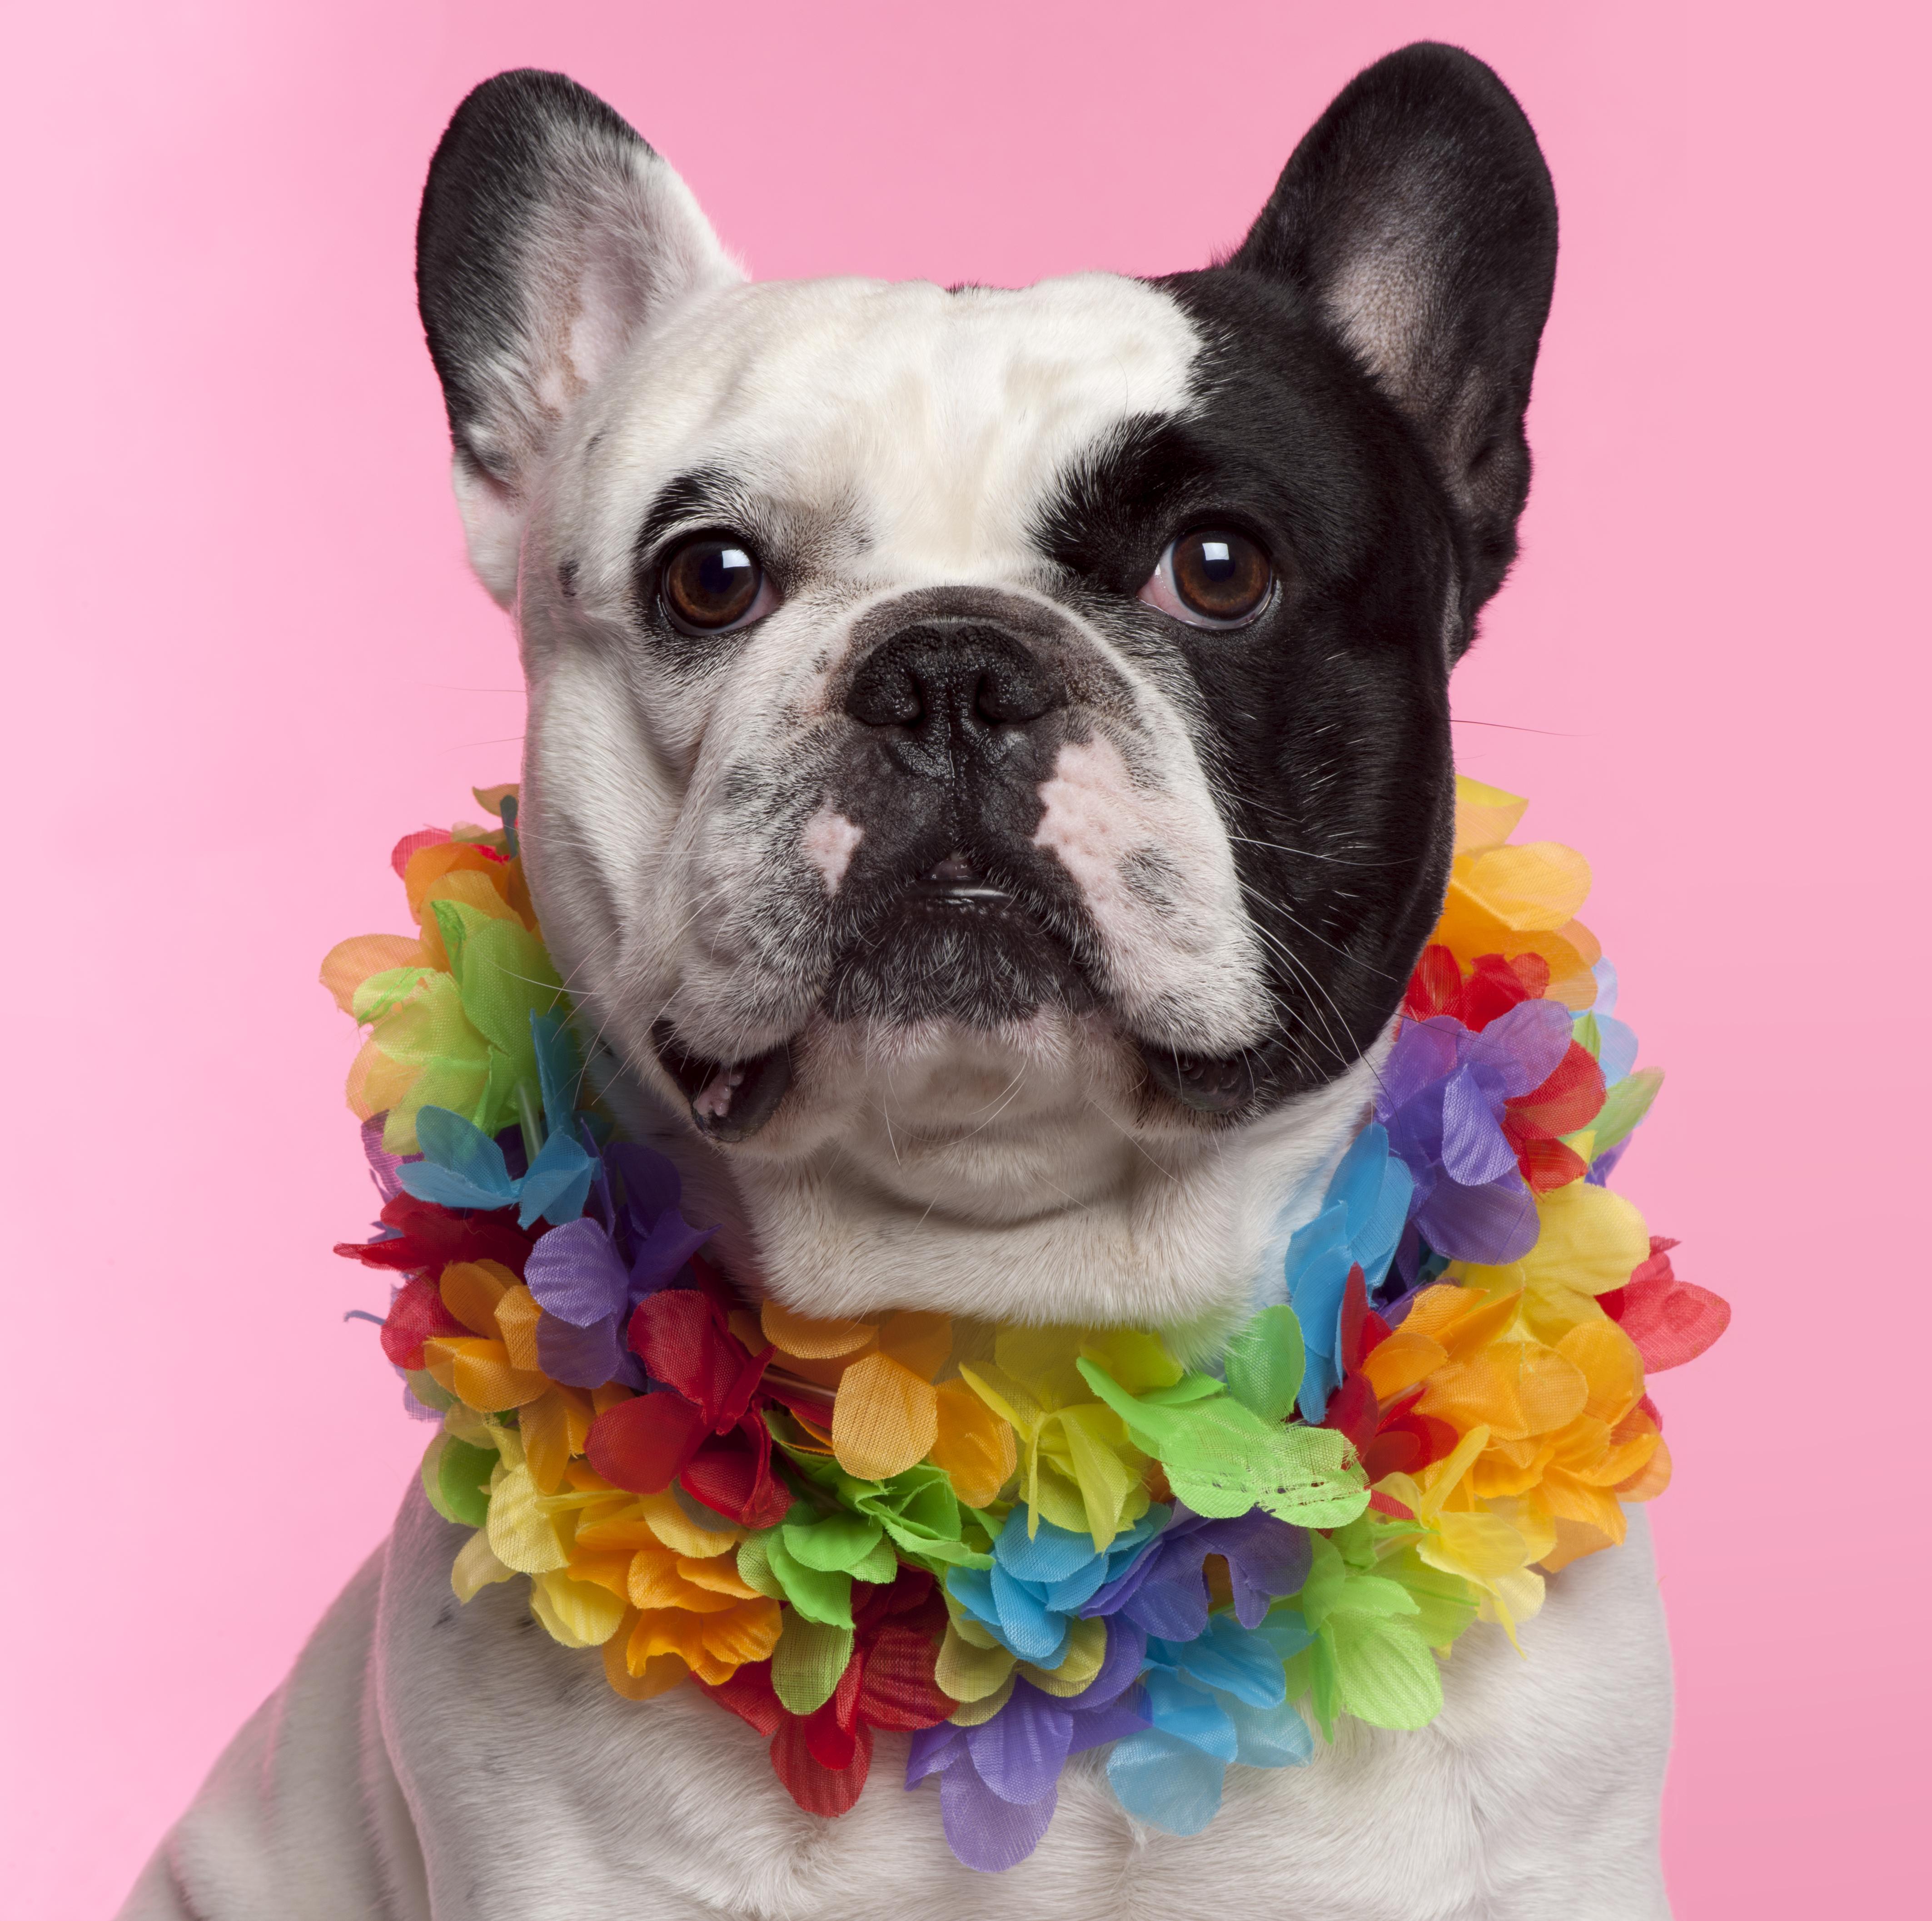 french-bulldog-3-years-old-wearing-hawaiian-lei-PDUV9VN-1